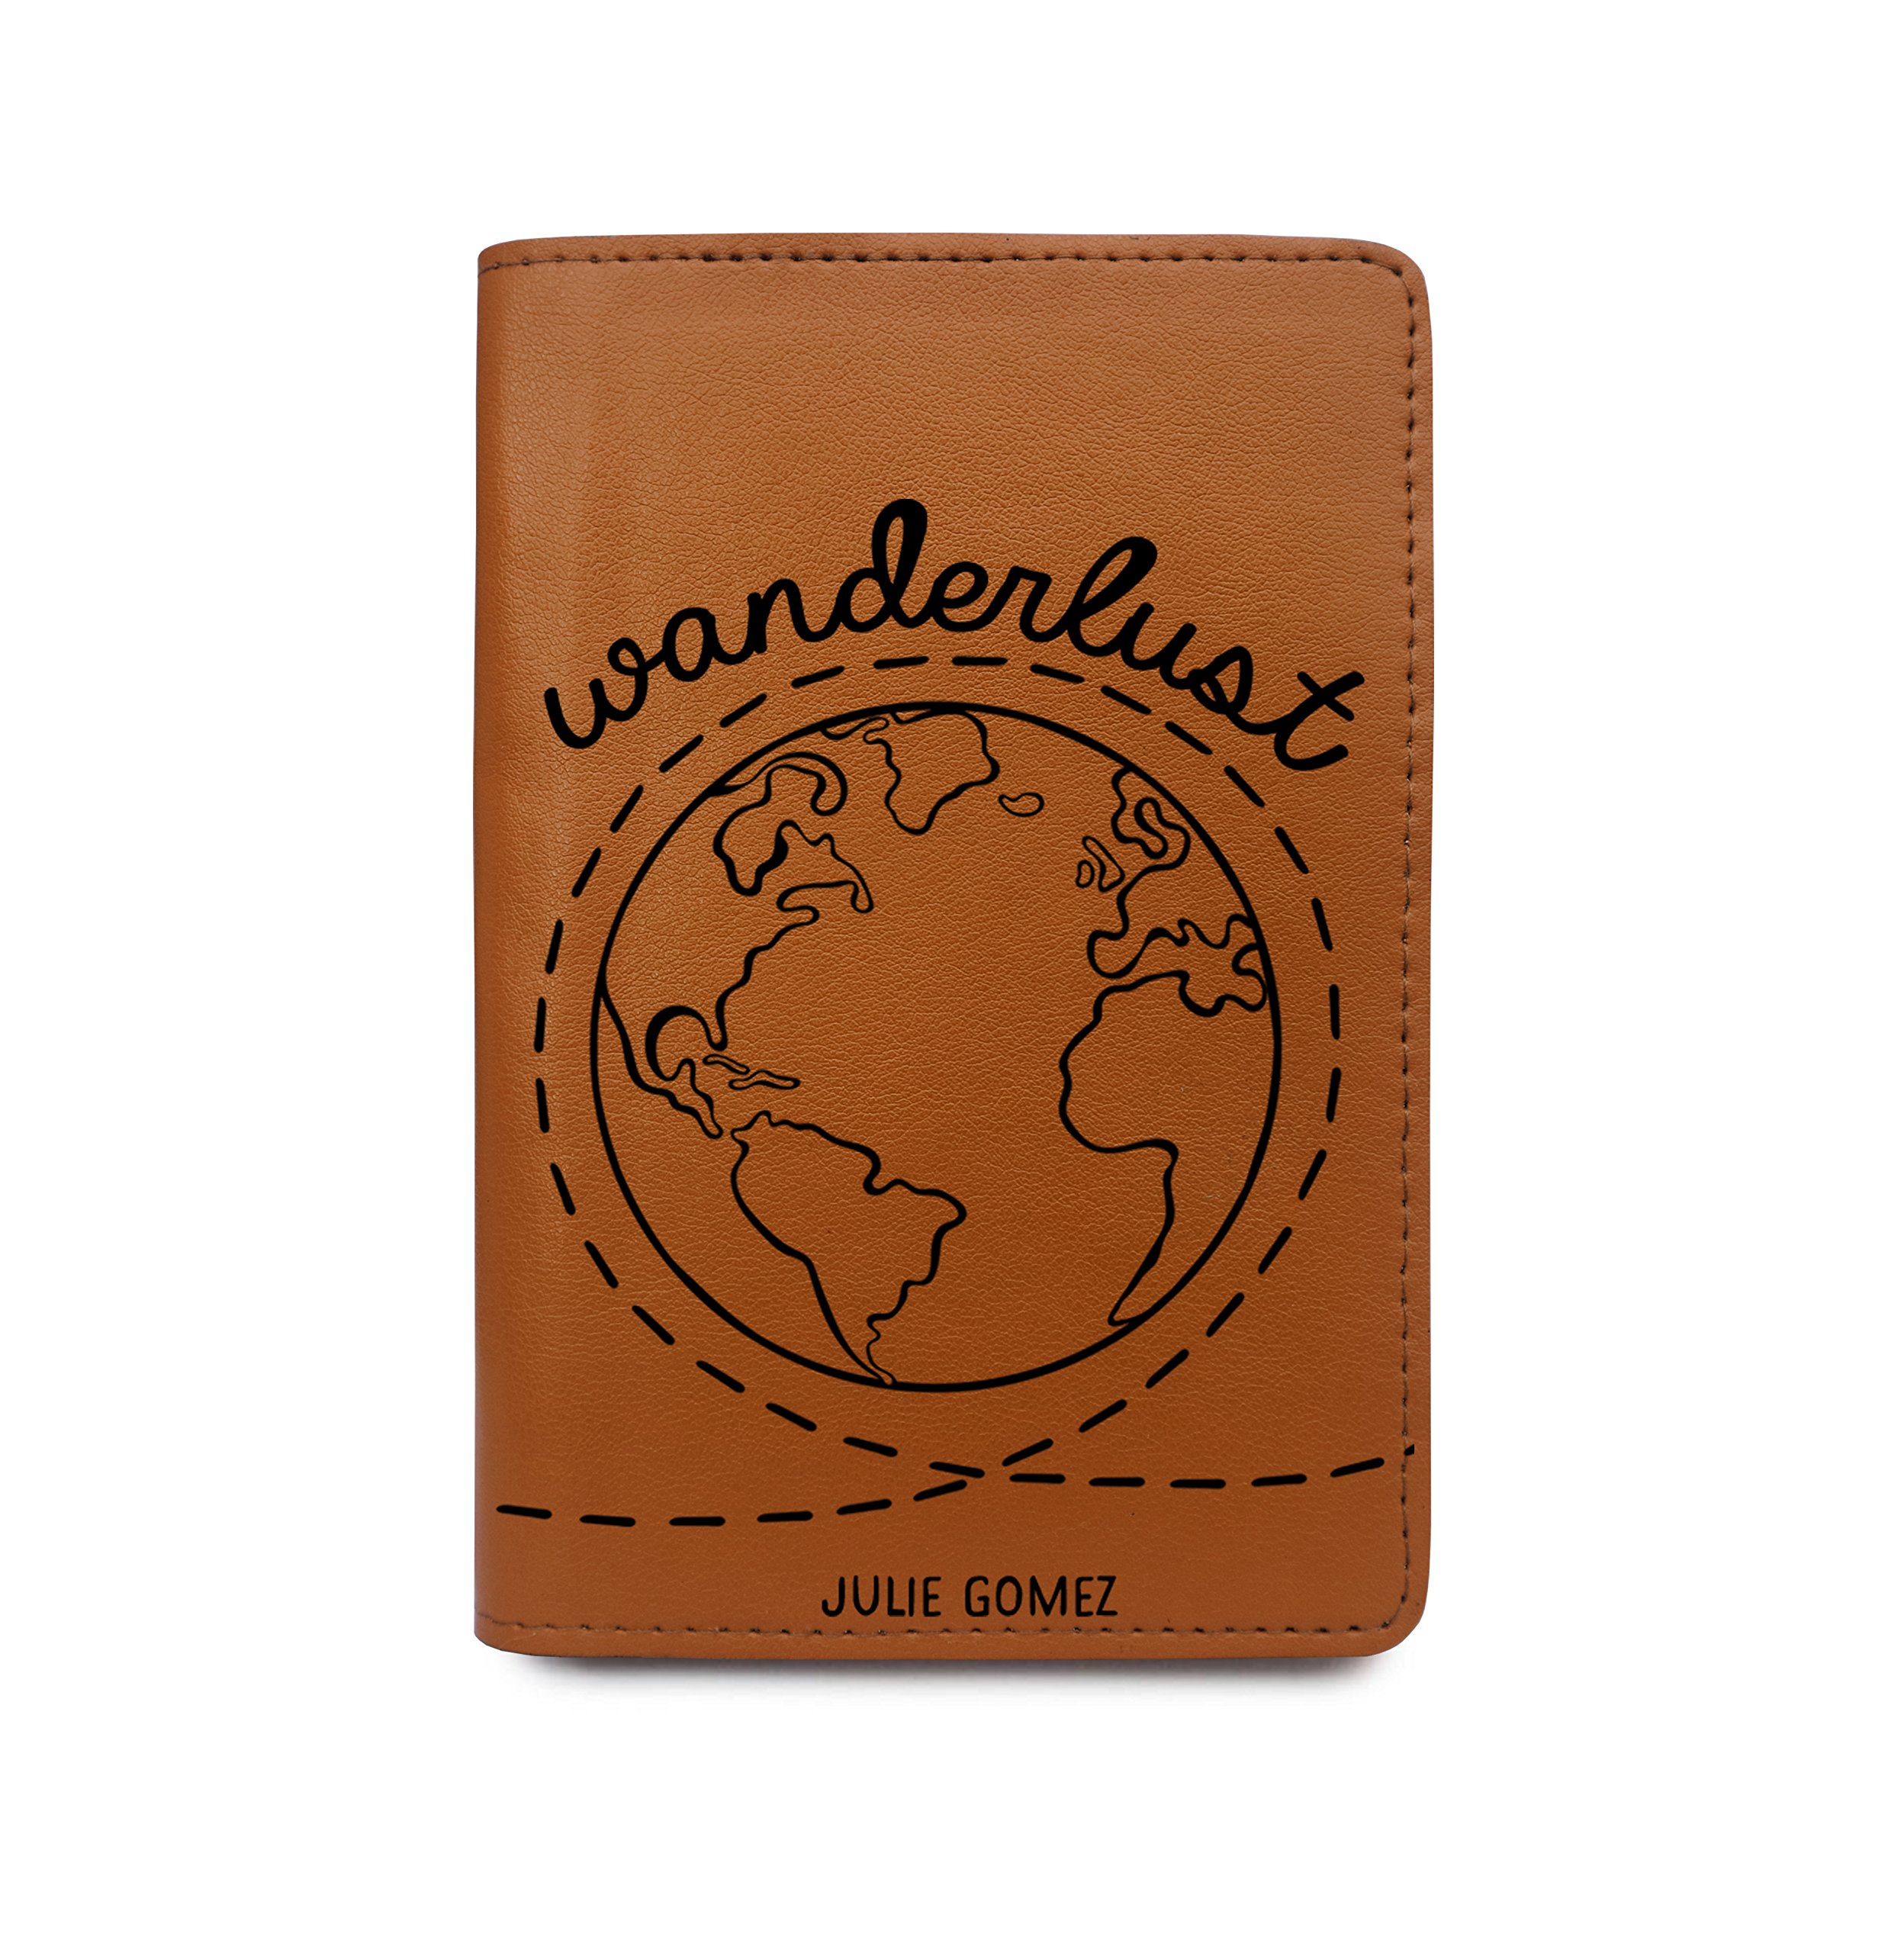 Personalized RFID Blocking Leather Passport Holder Wanderlust World